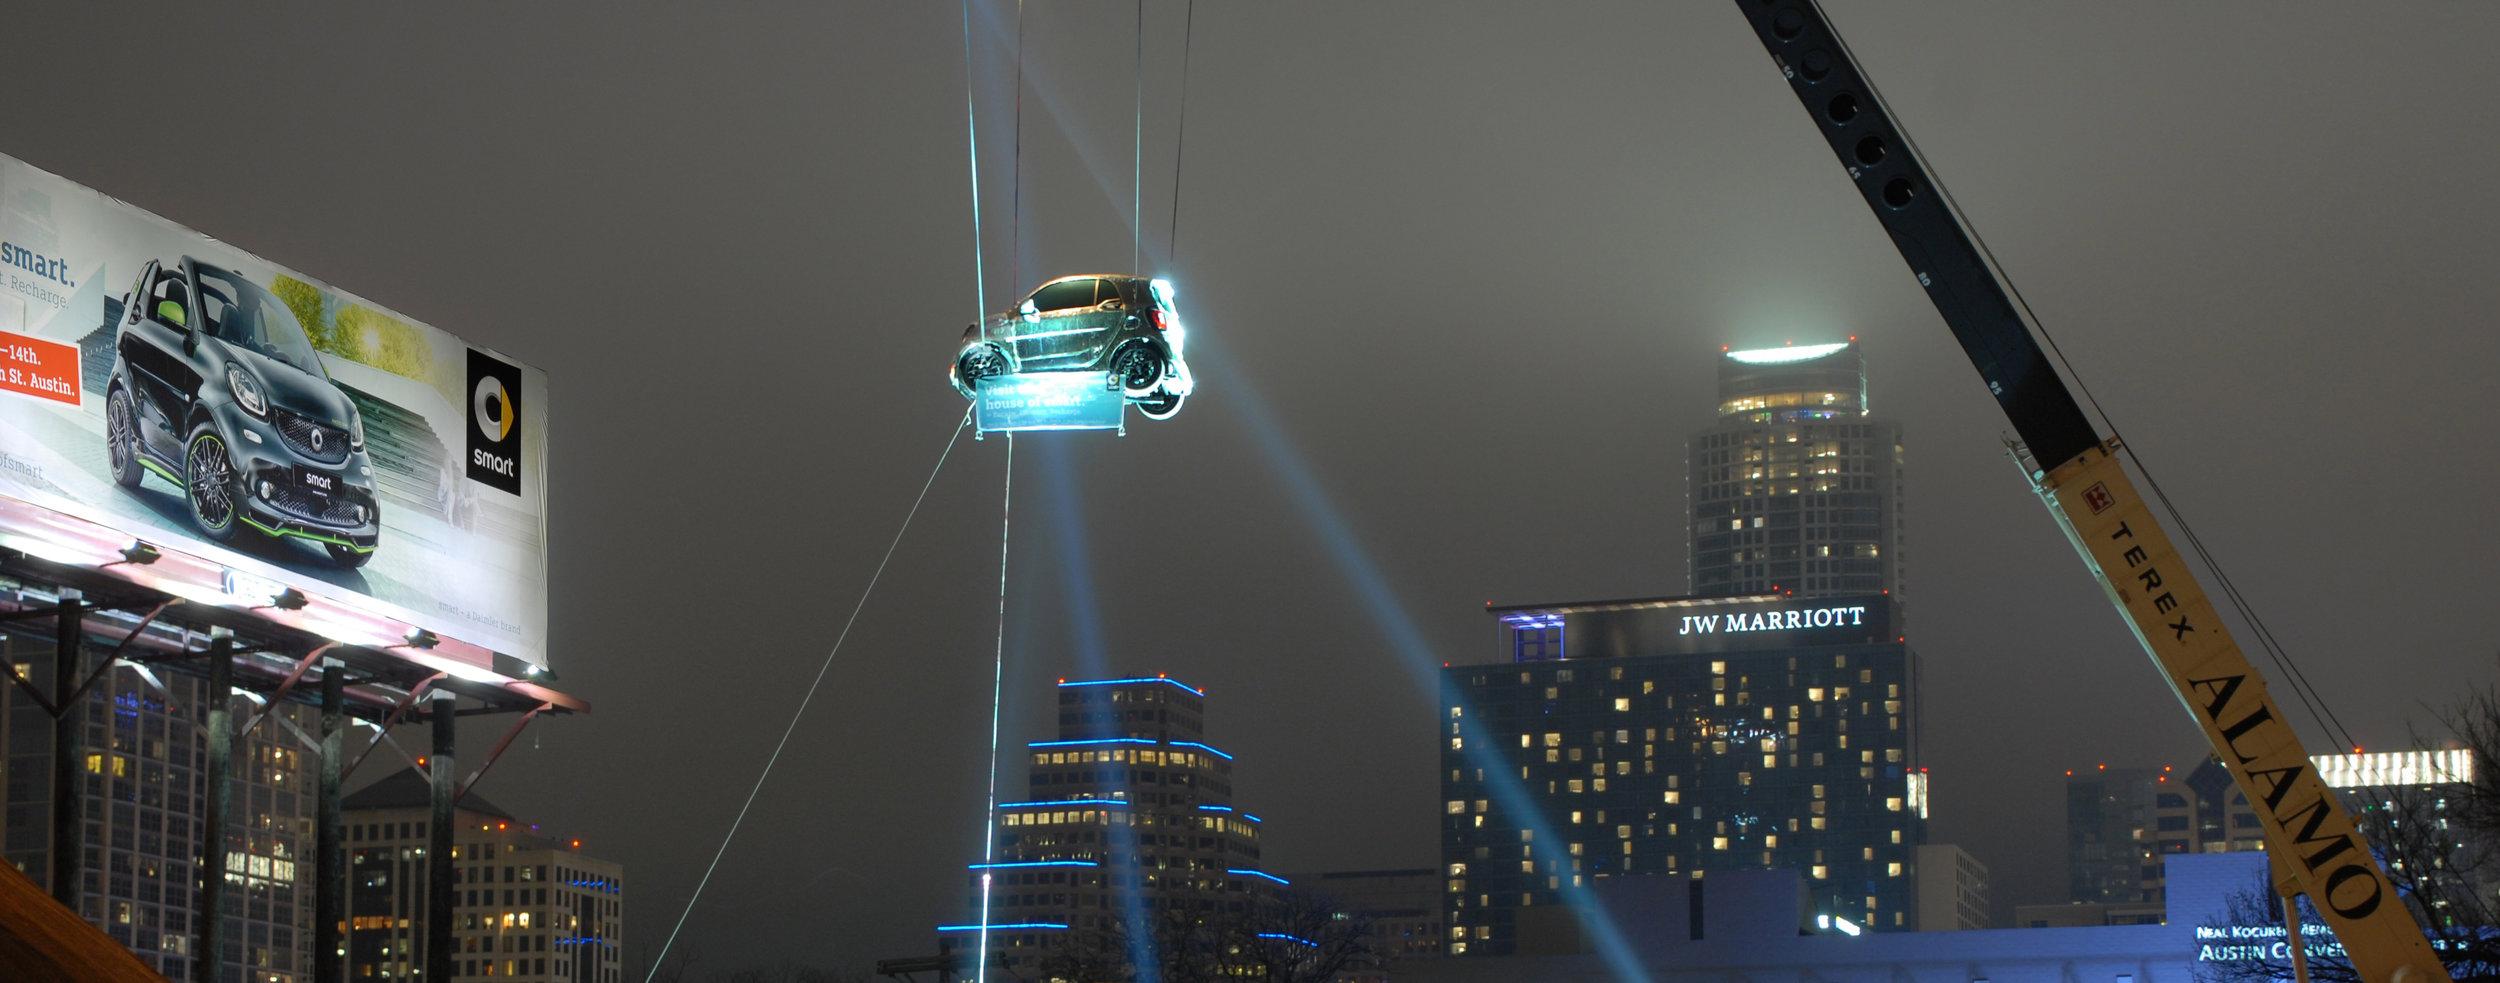 Disco ball smart = smart billboard - night fog .jpg